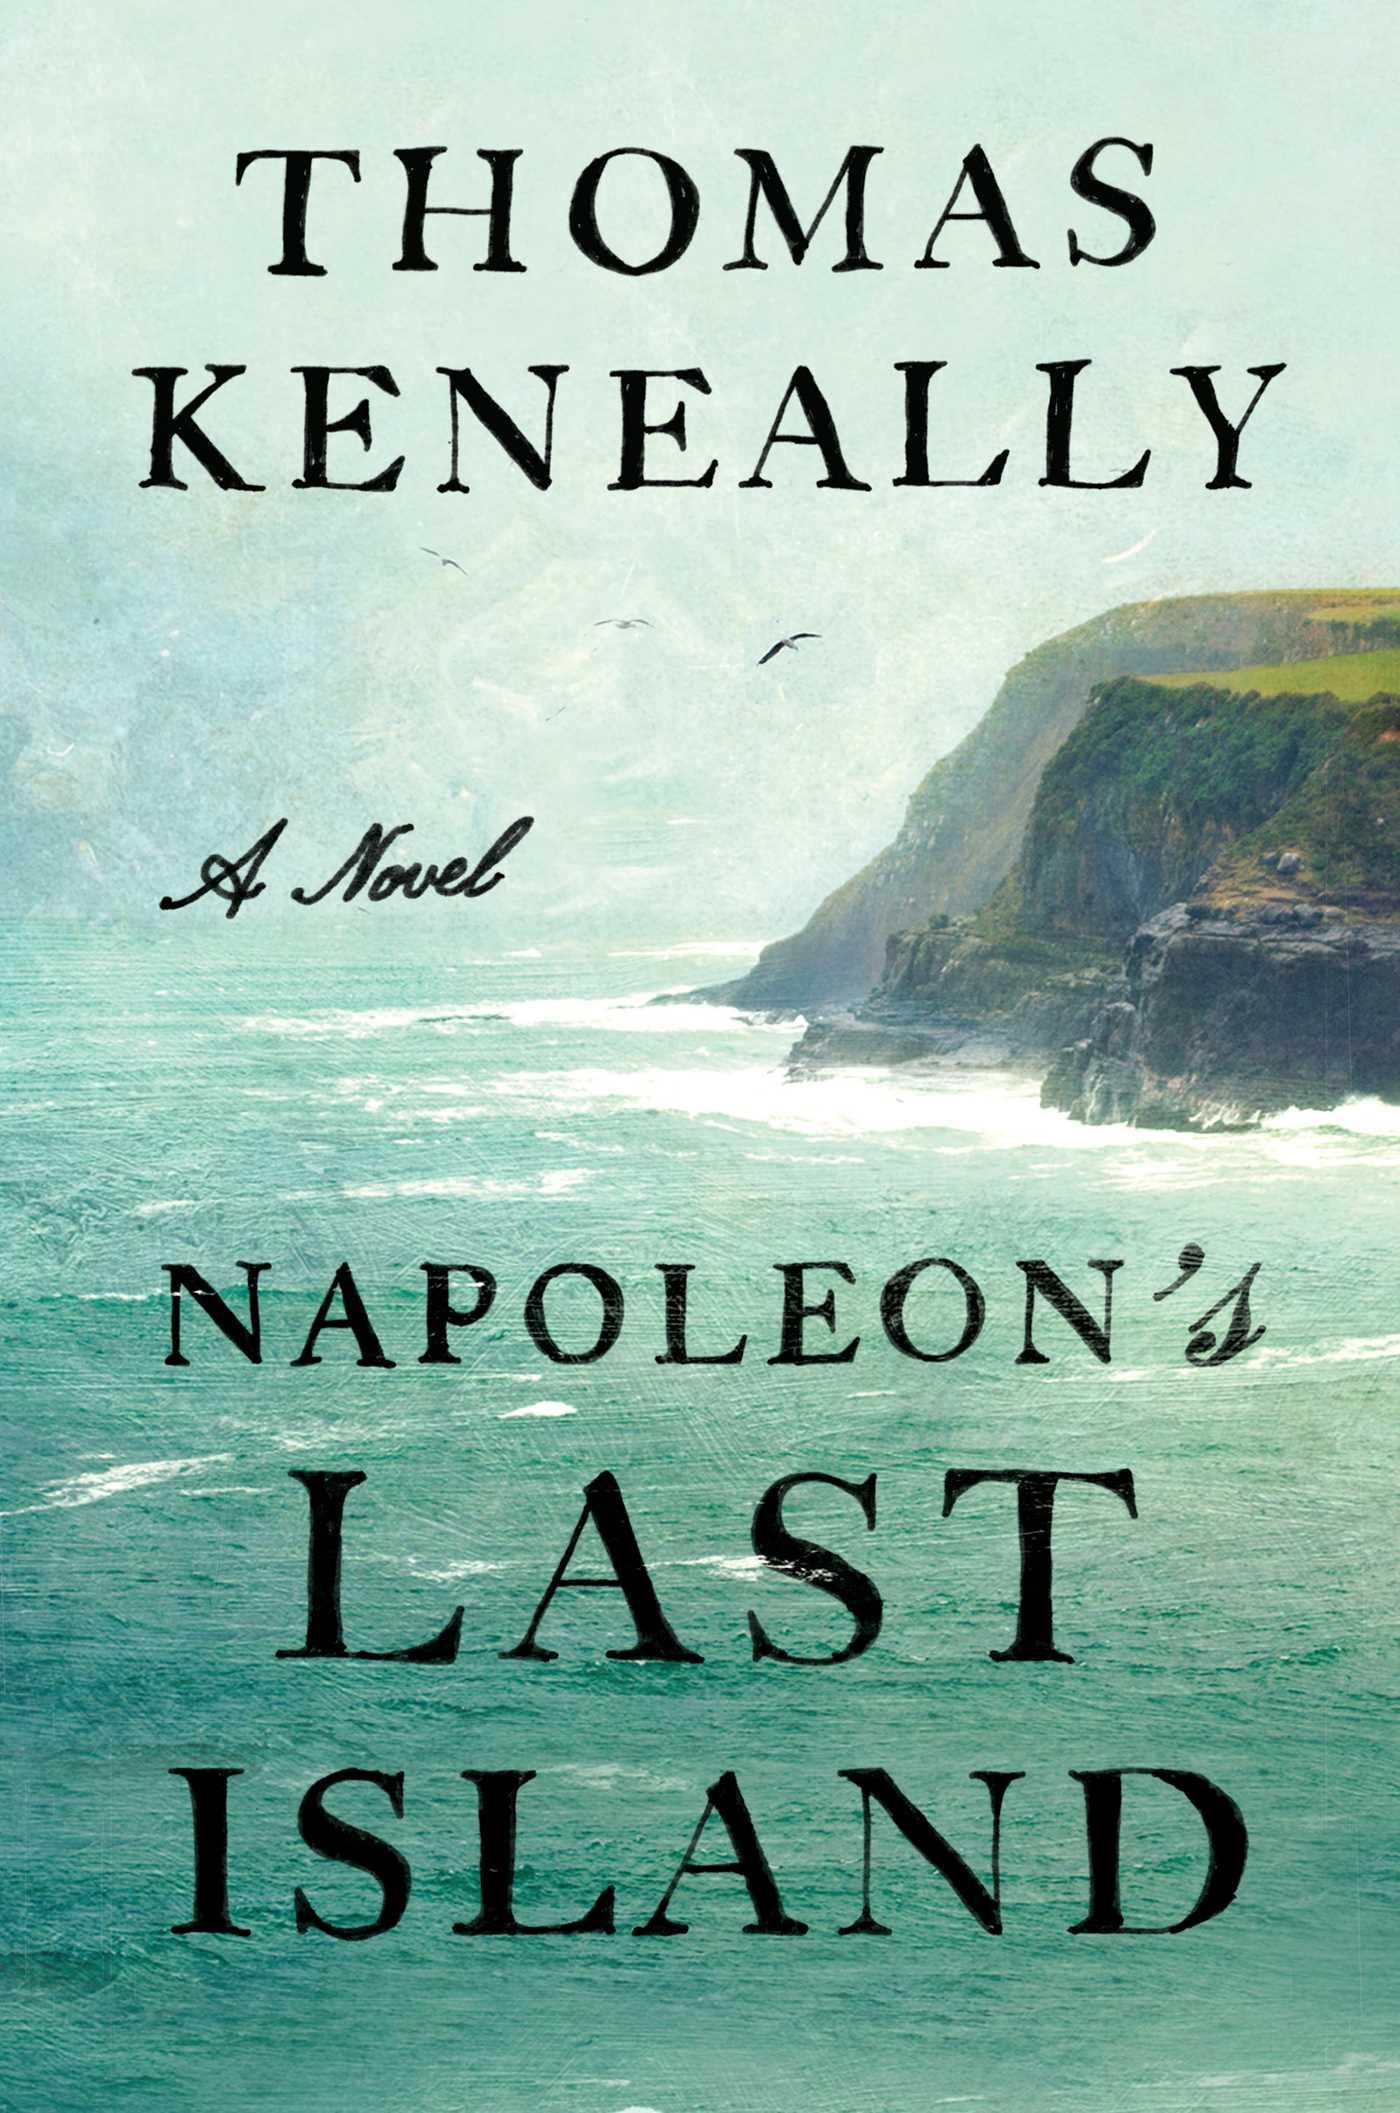 Napoleons last island 9781501128424 hr